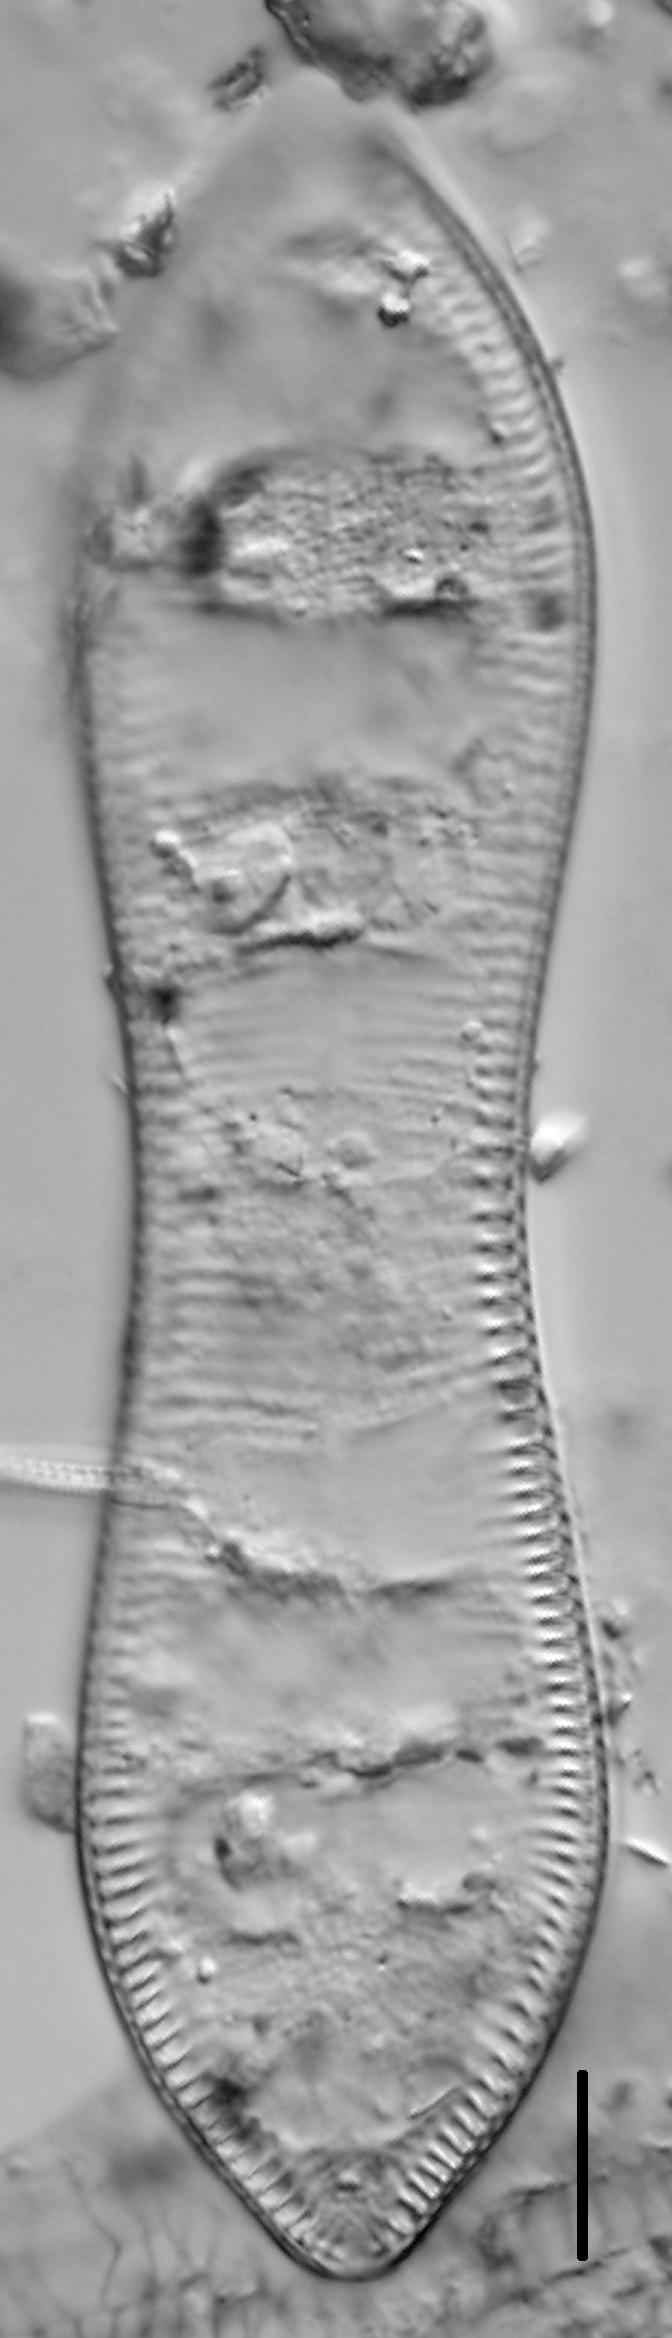 Cymatopleura solea LM3